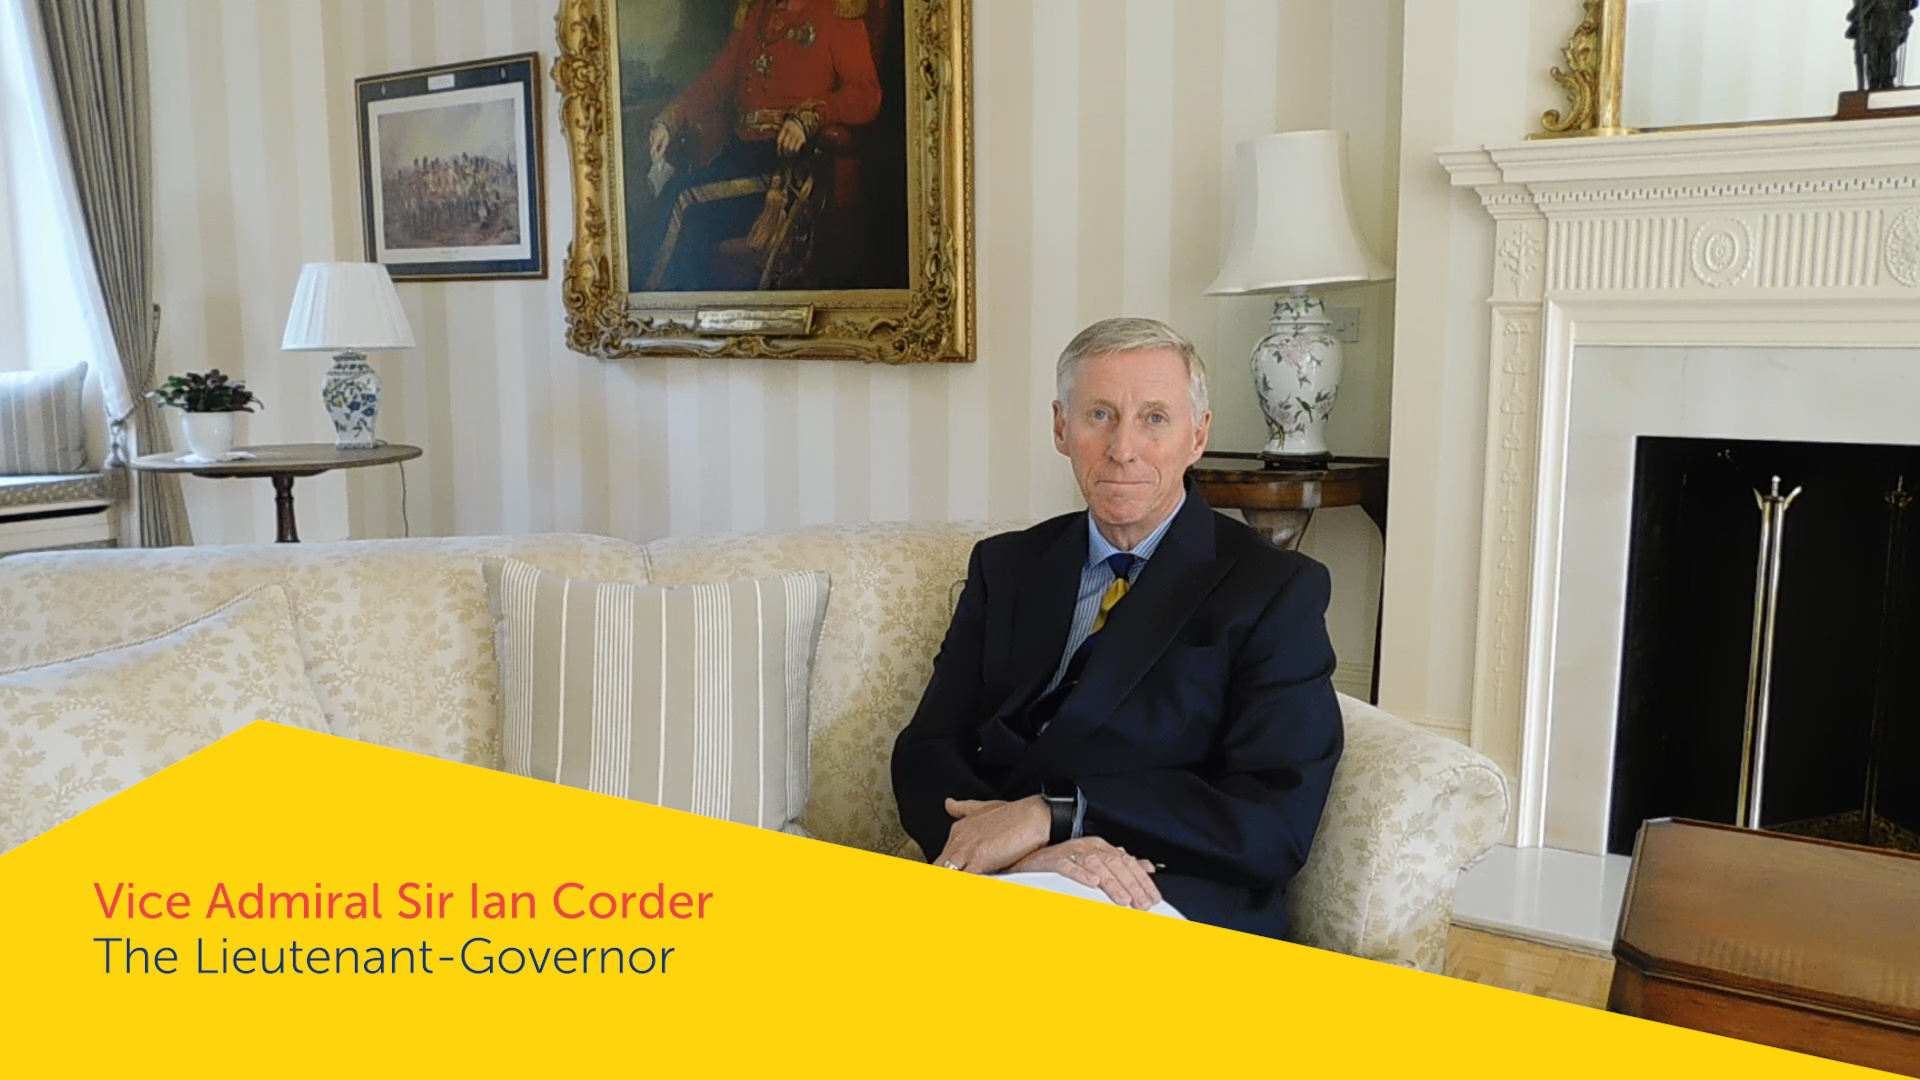 Vice Admiral Sir Ian Corder